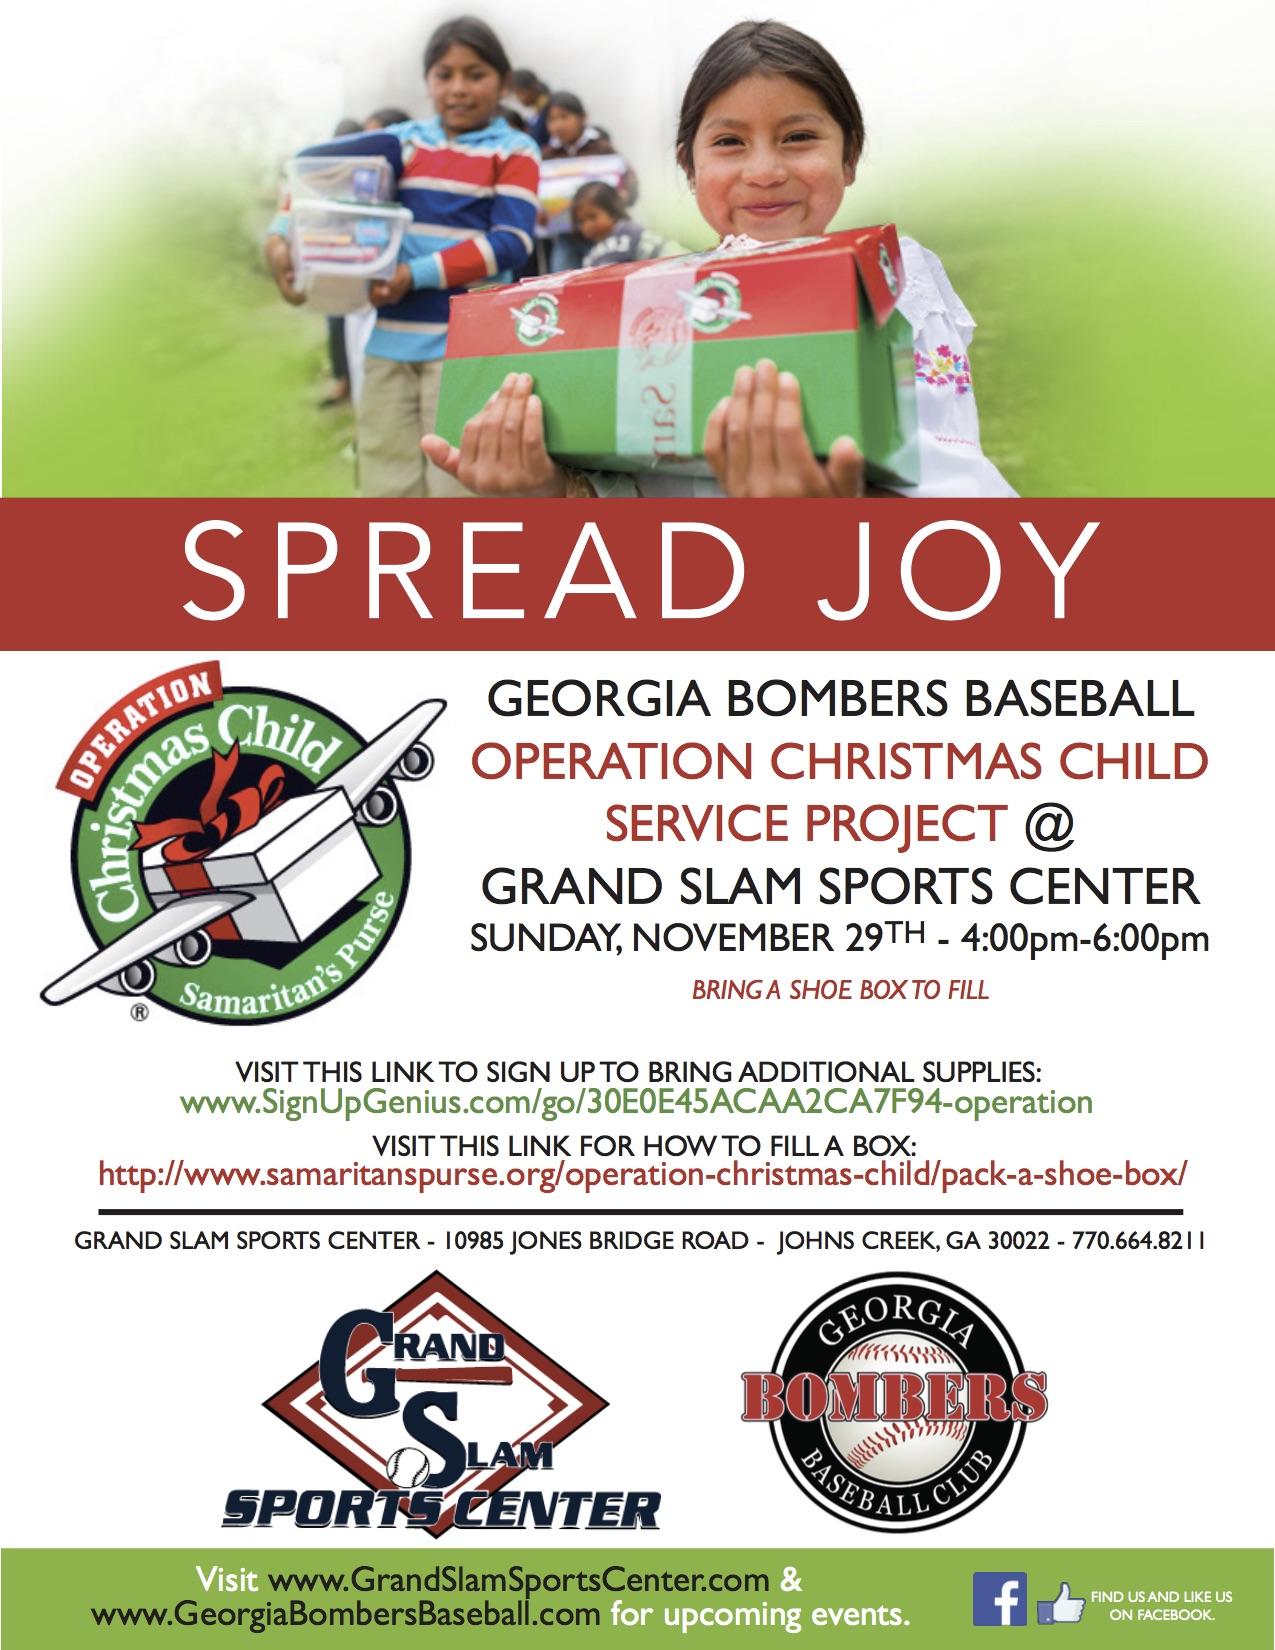 Georgia Bombers – Operation Christmas Child